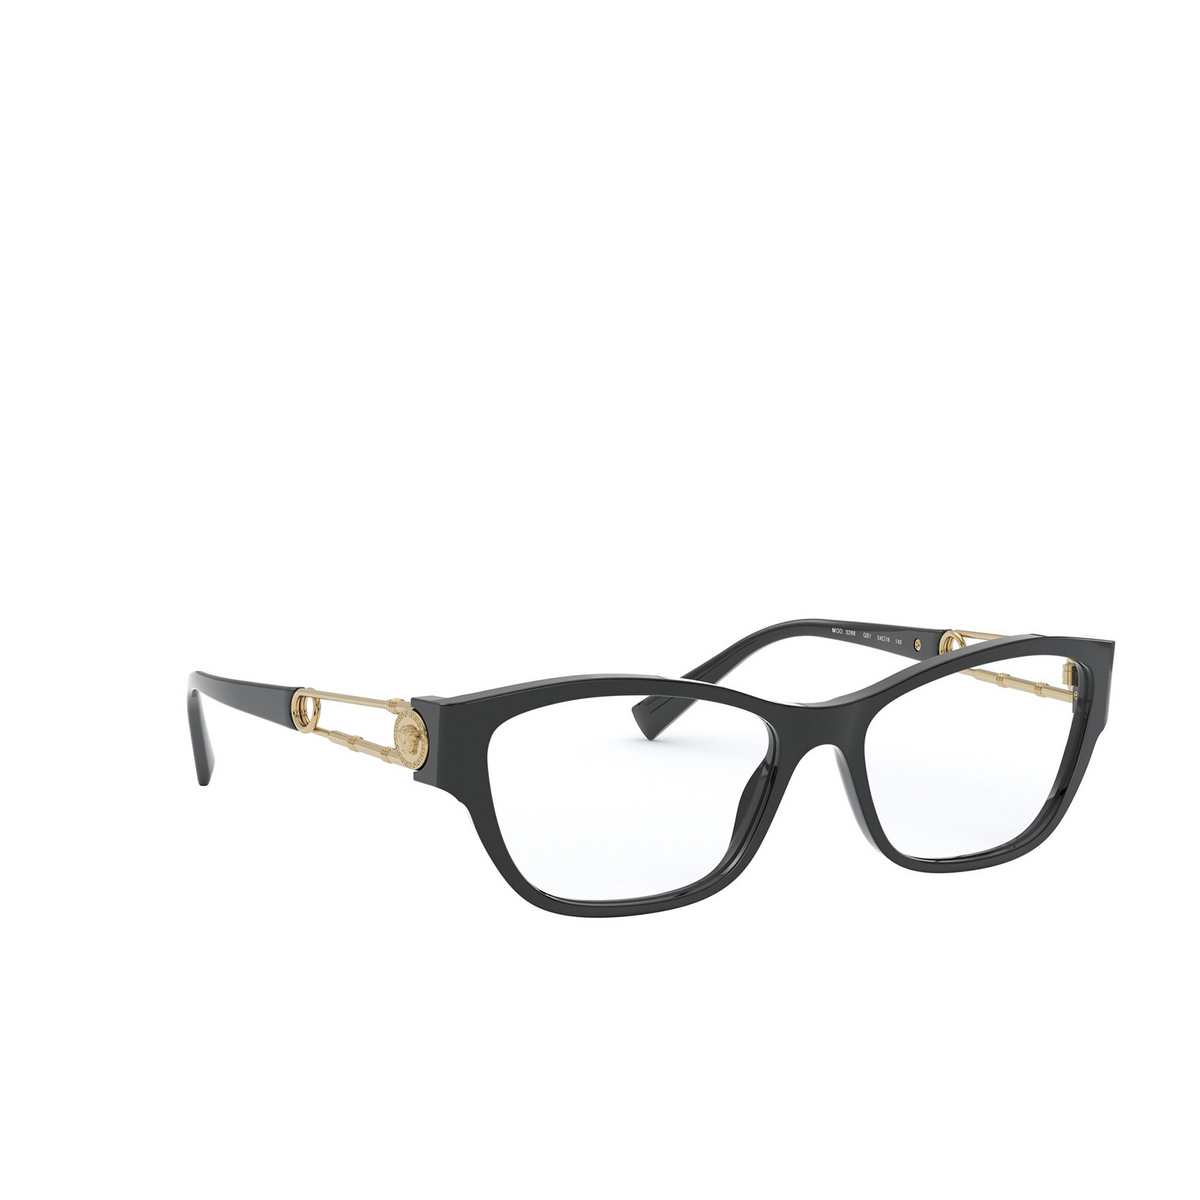 Versace® Cat-eye Eyeglasses: VE3288 color Black GB1 - three-quarters view.